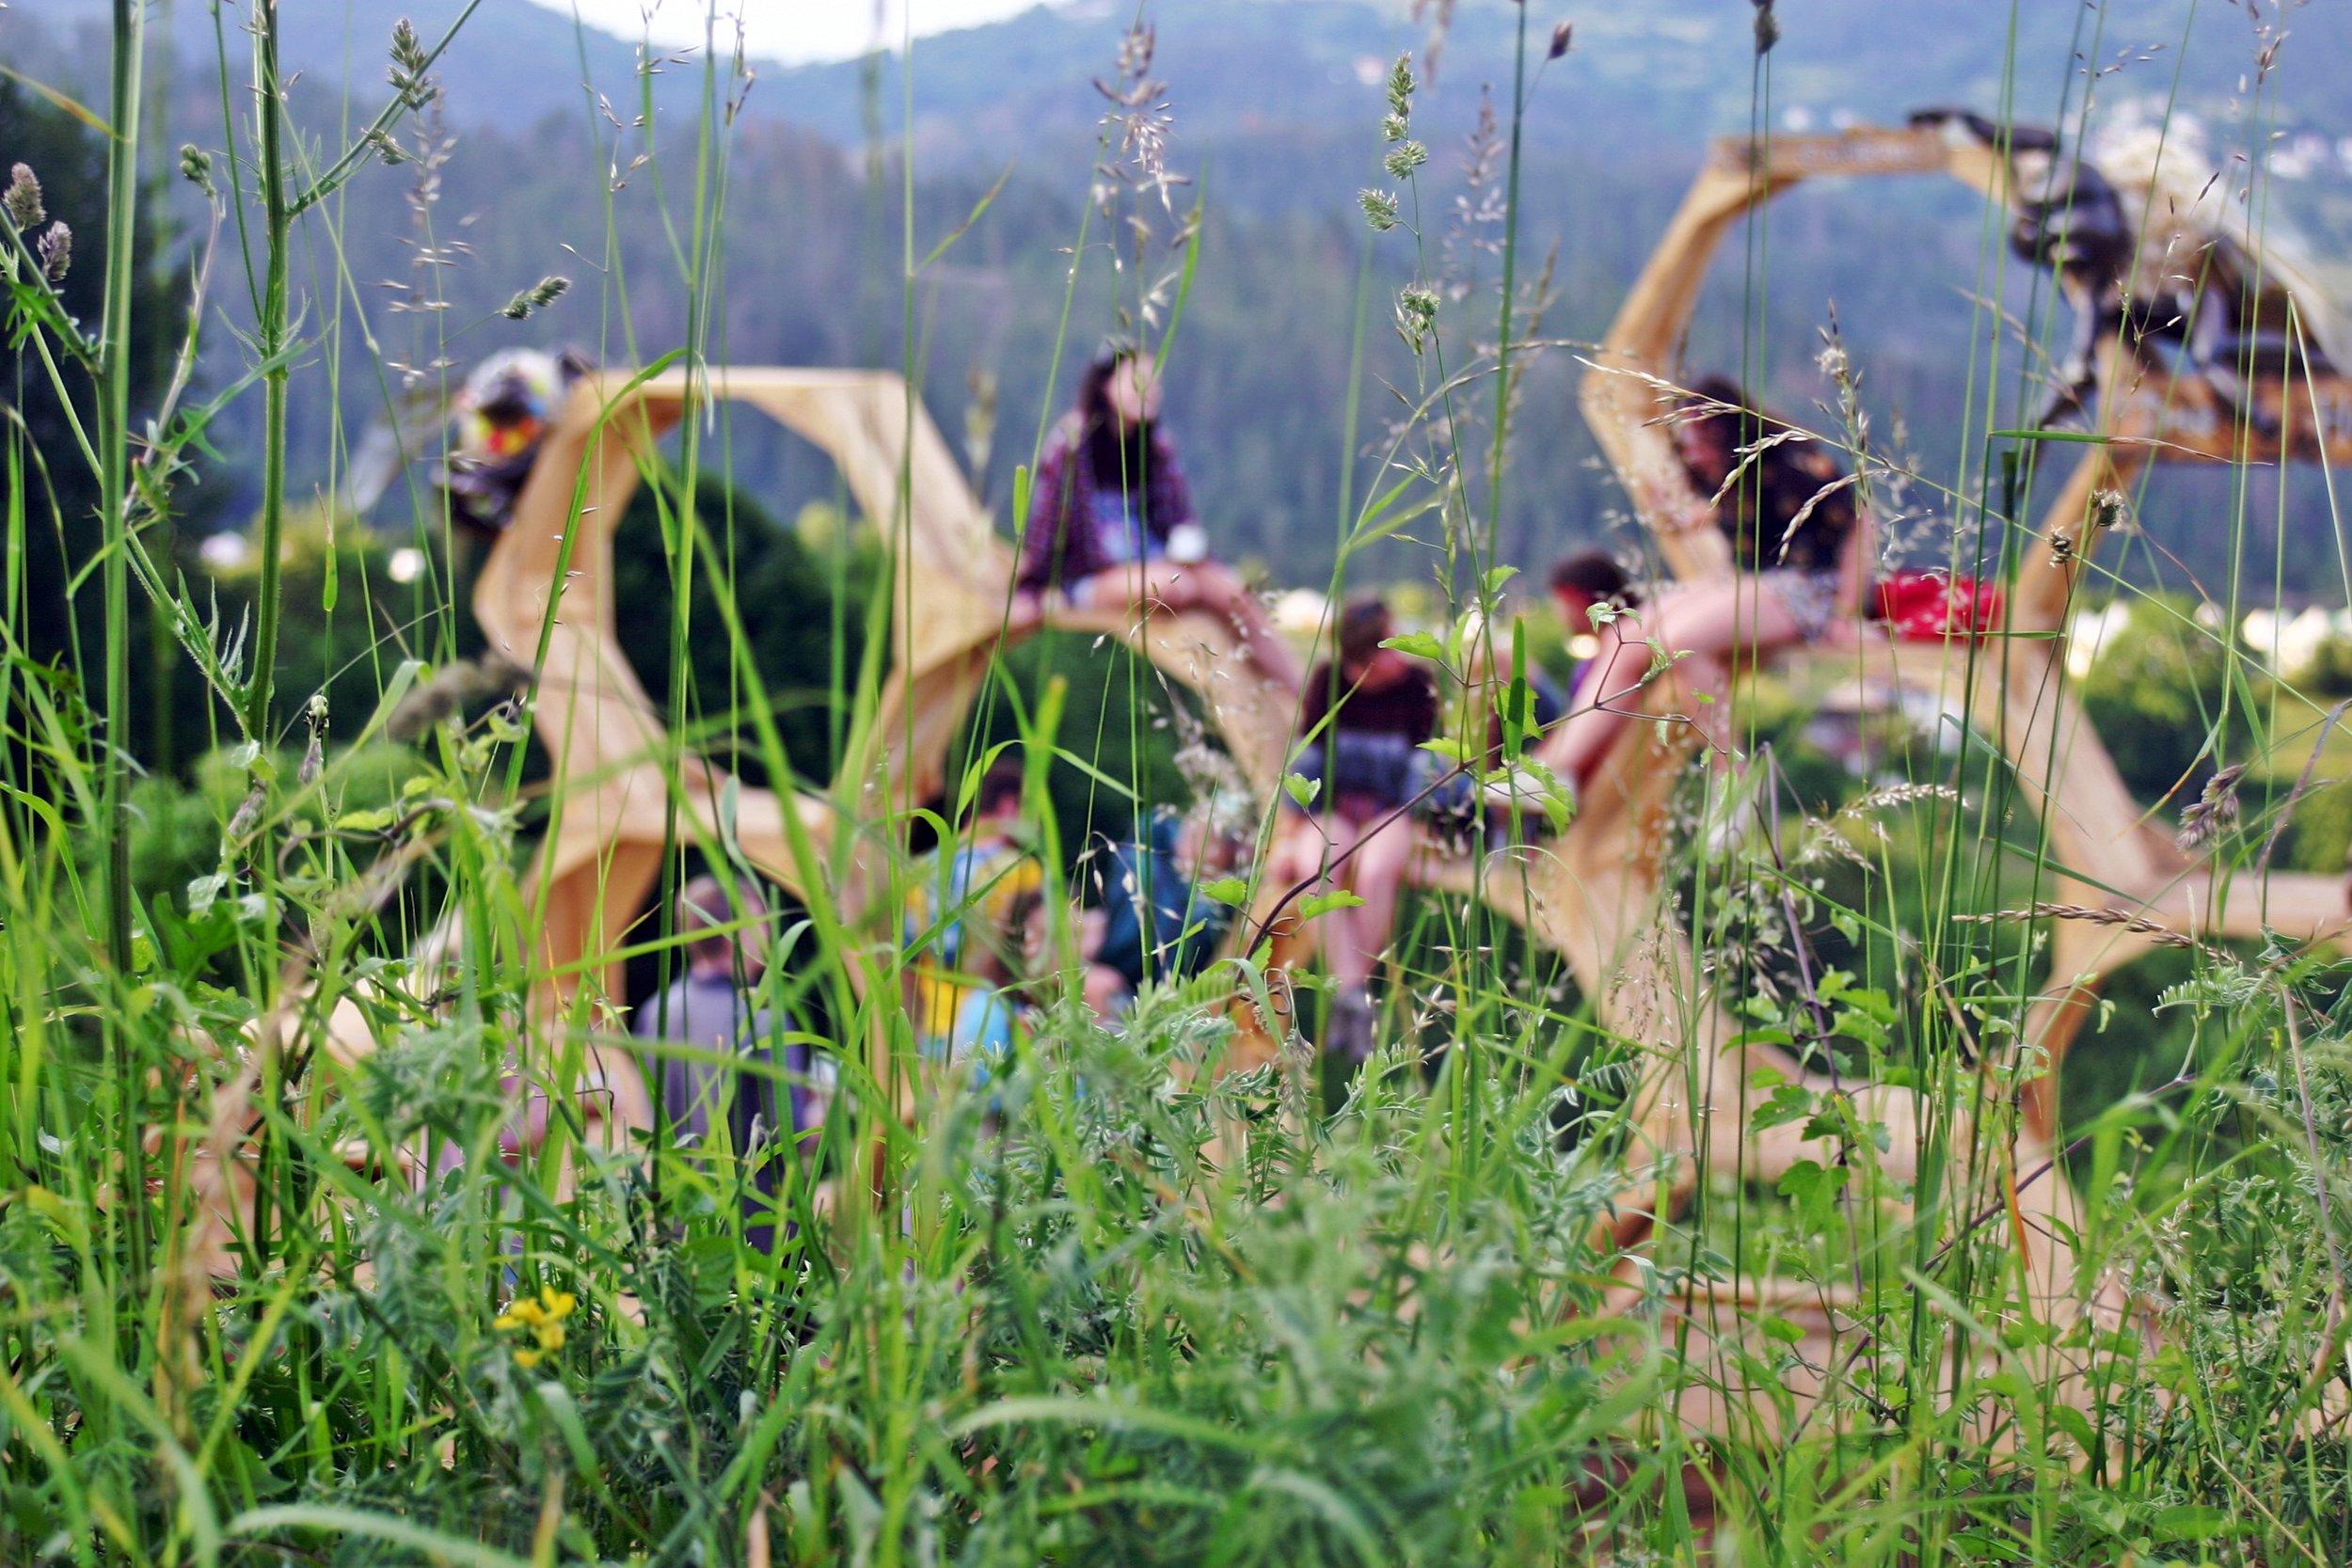 MEADOWS IN THE MOUNTAIN - BULGARIA